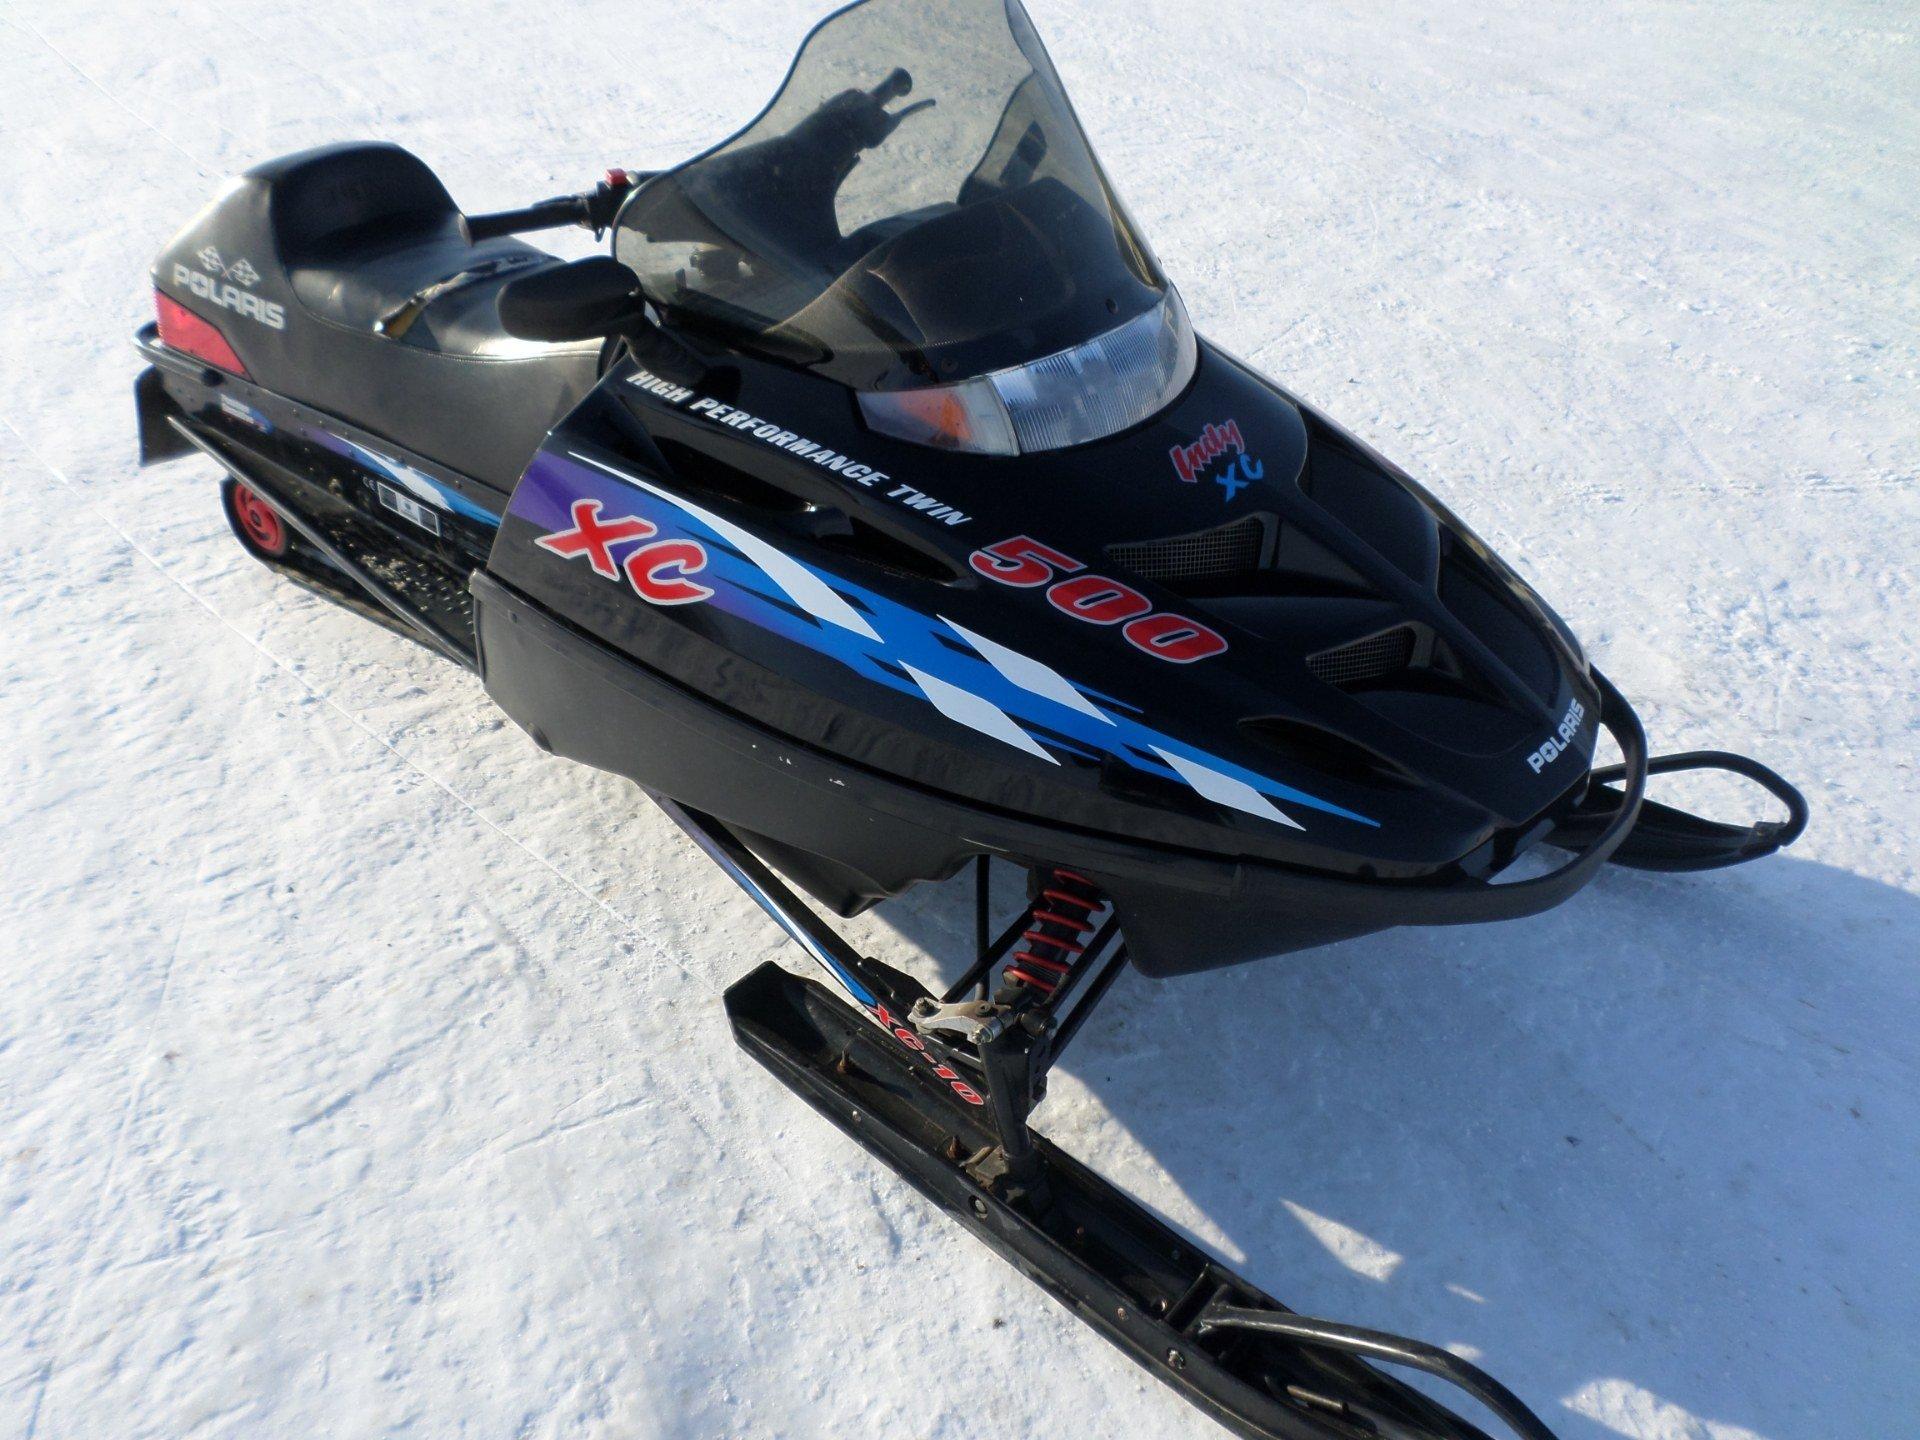 2000 Polaris Indy 500 XC for sale 2871